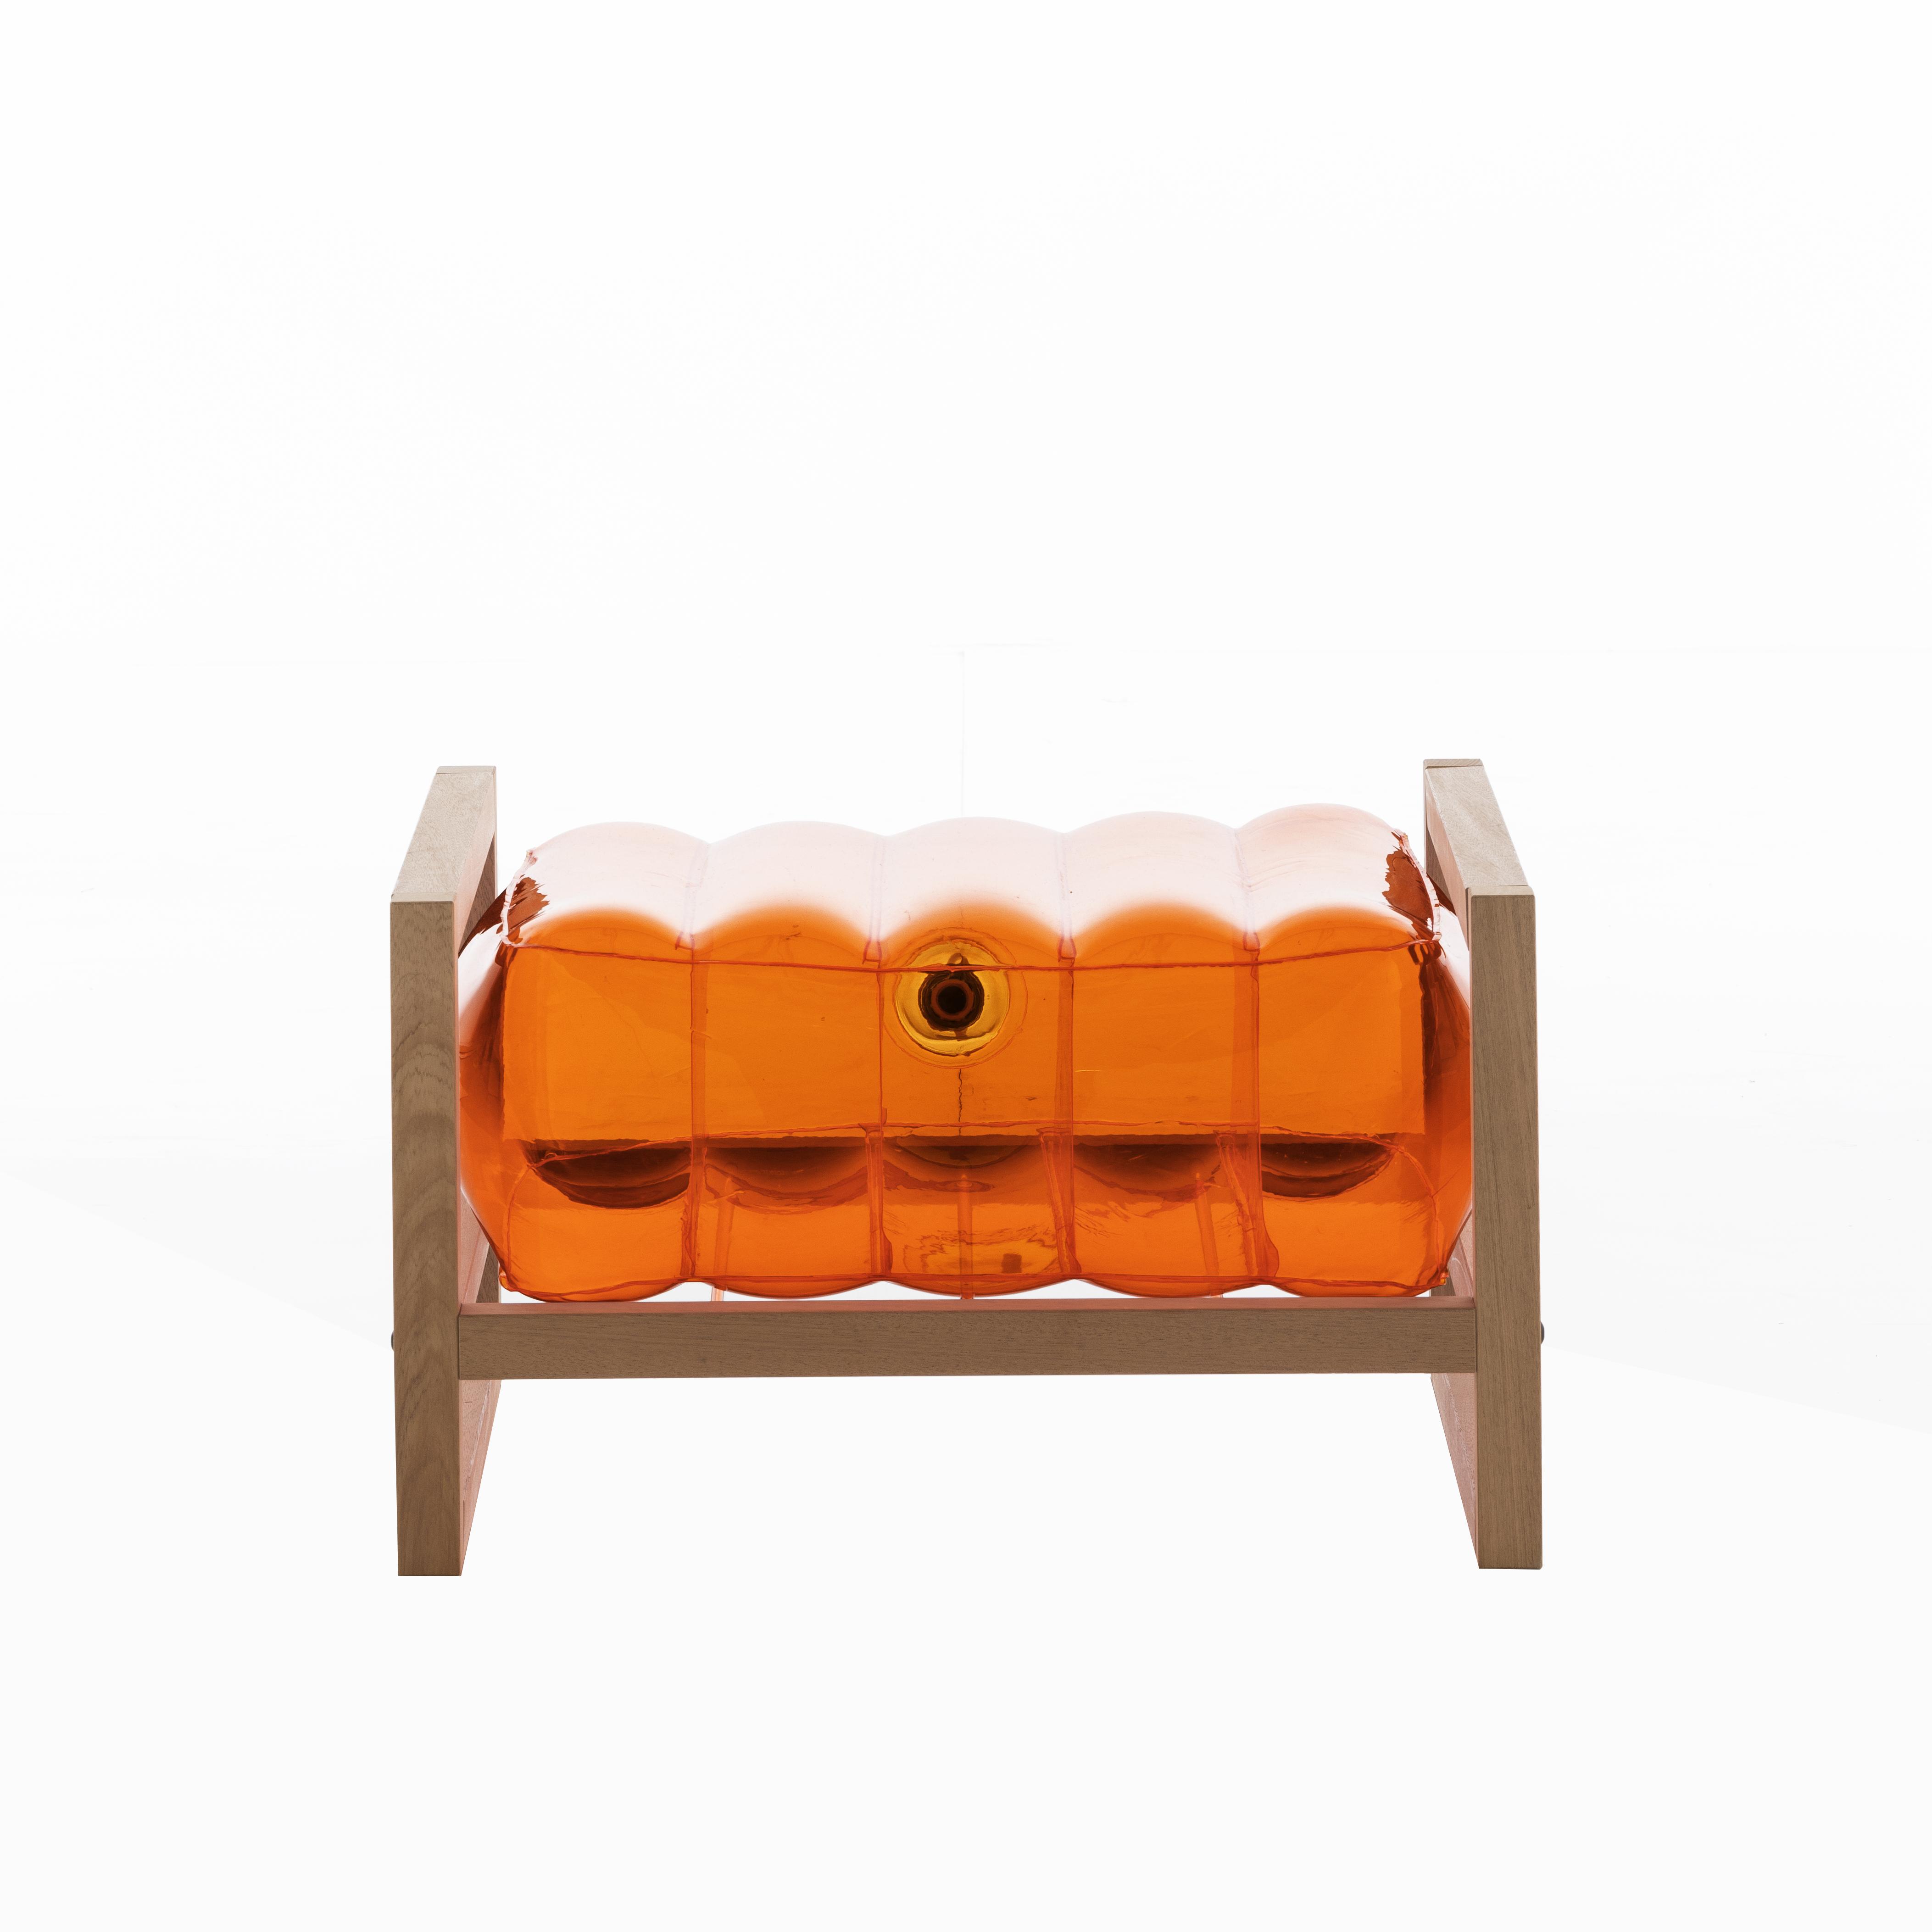 Pouf pvc orange cadre en bois